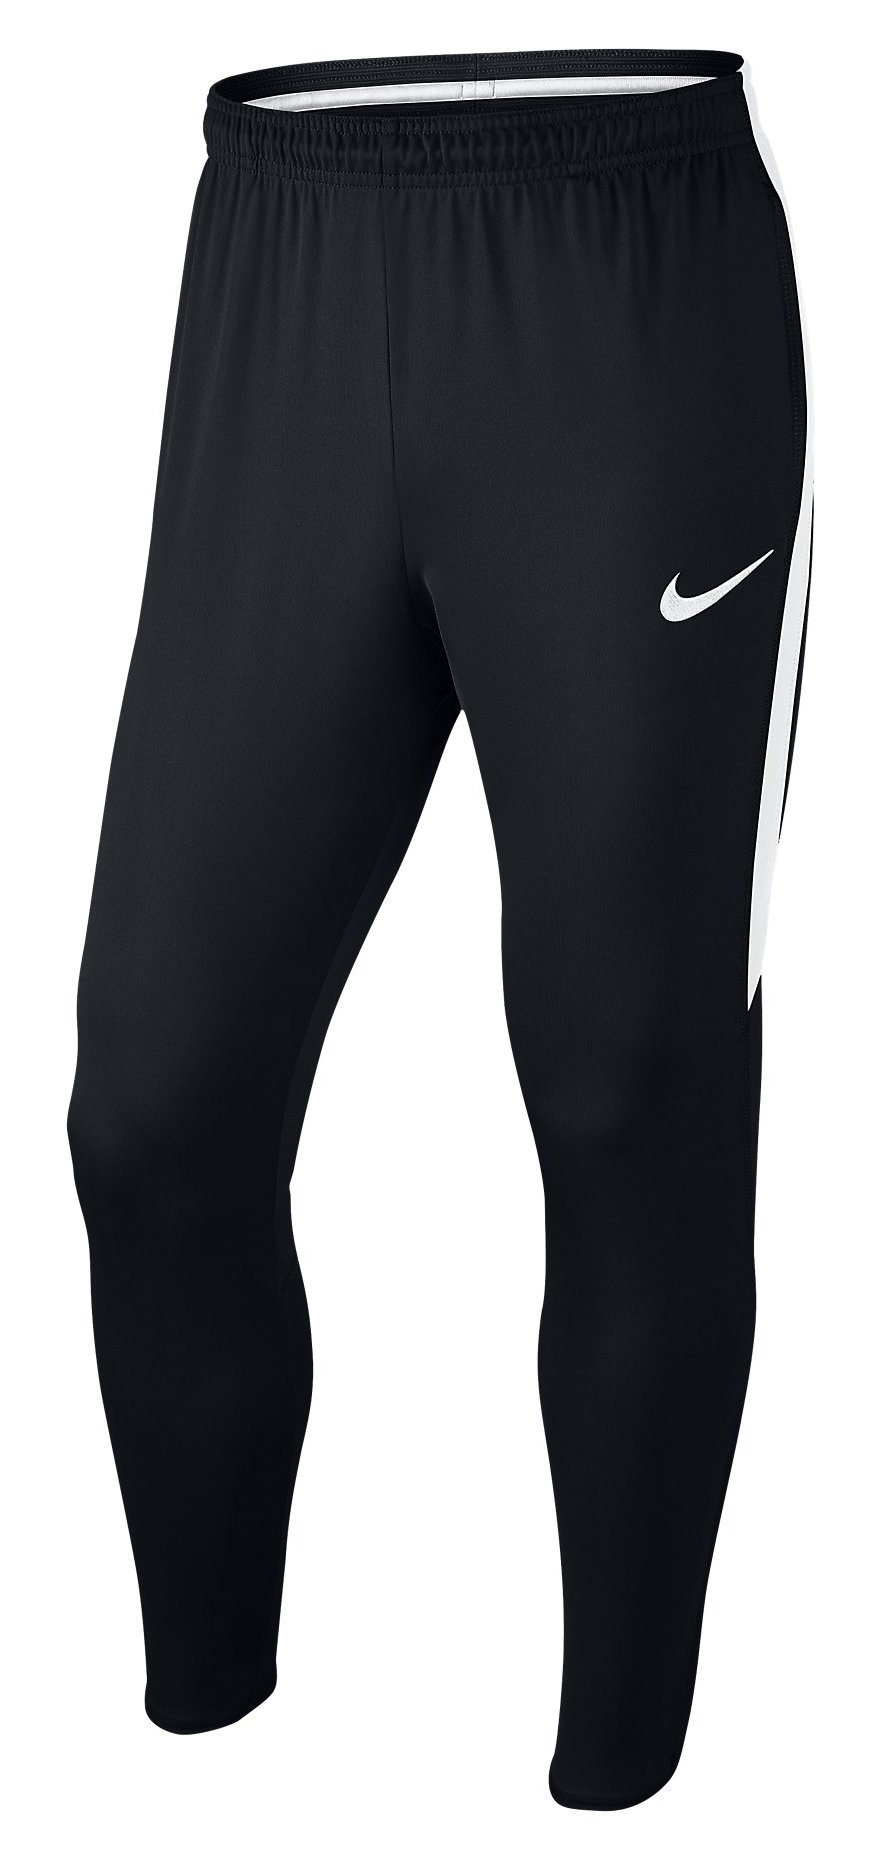 97d4dfb71 Pánské fotbalové kalhoty Nike Dry Squad - Top4Football.cz